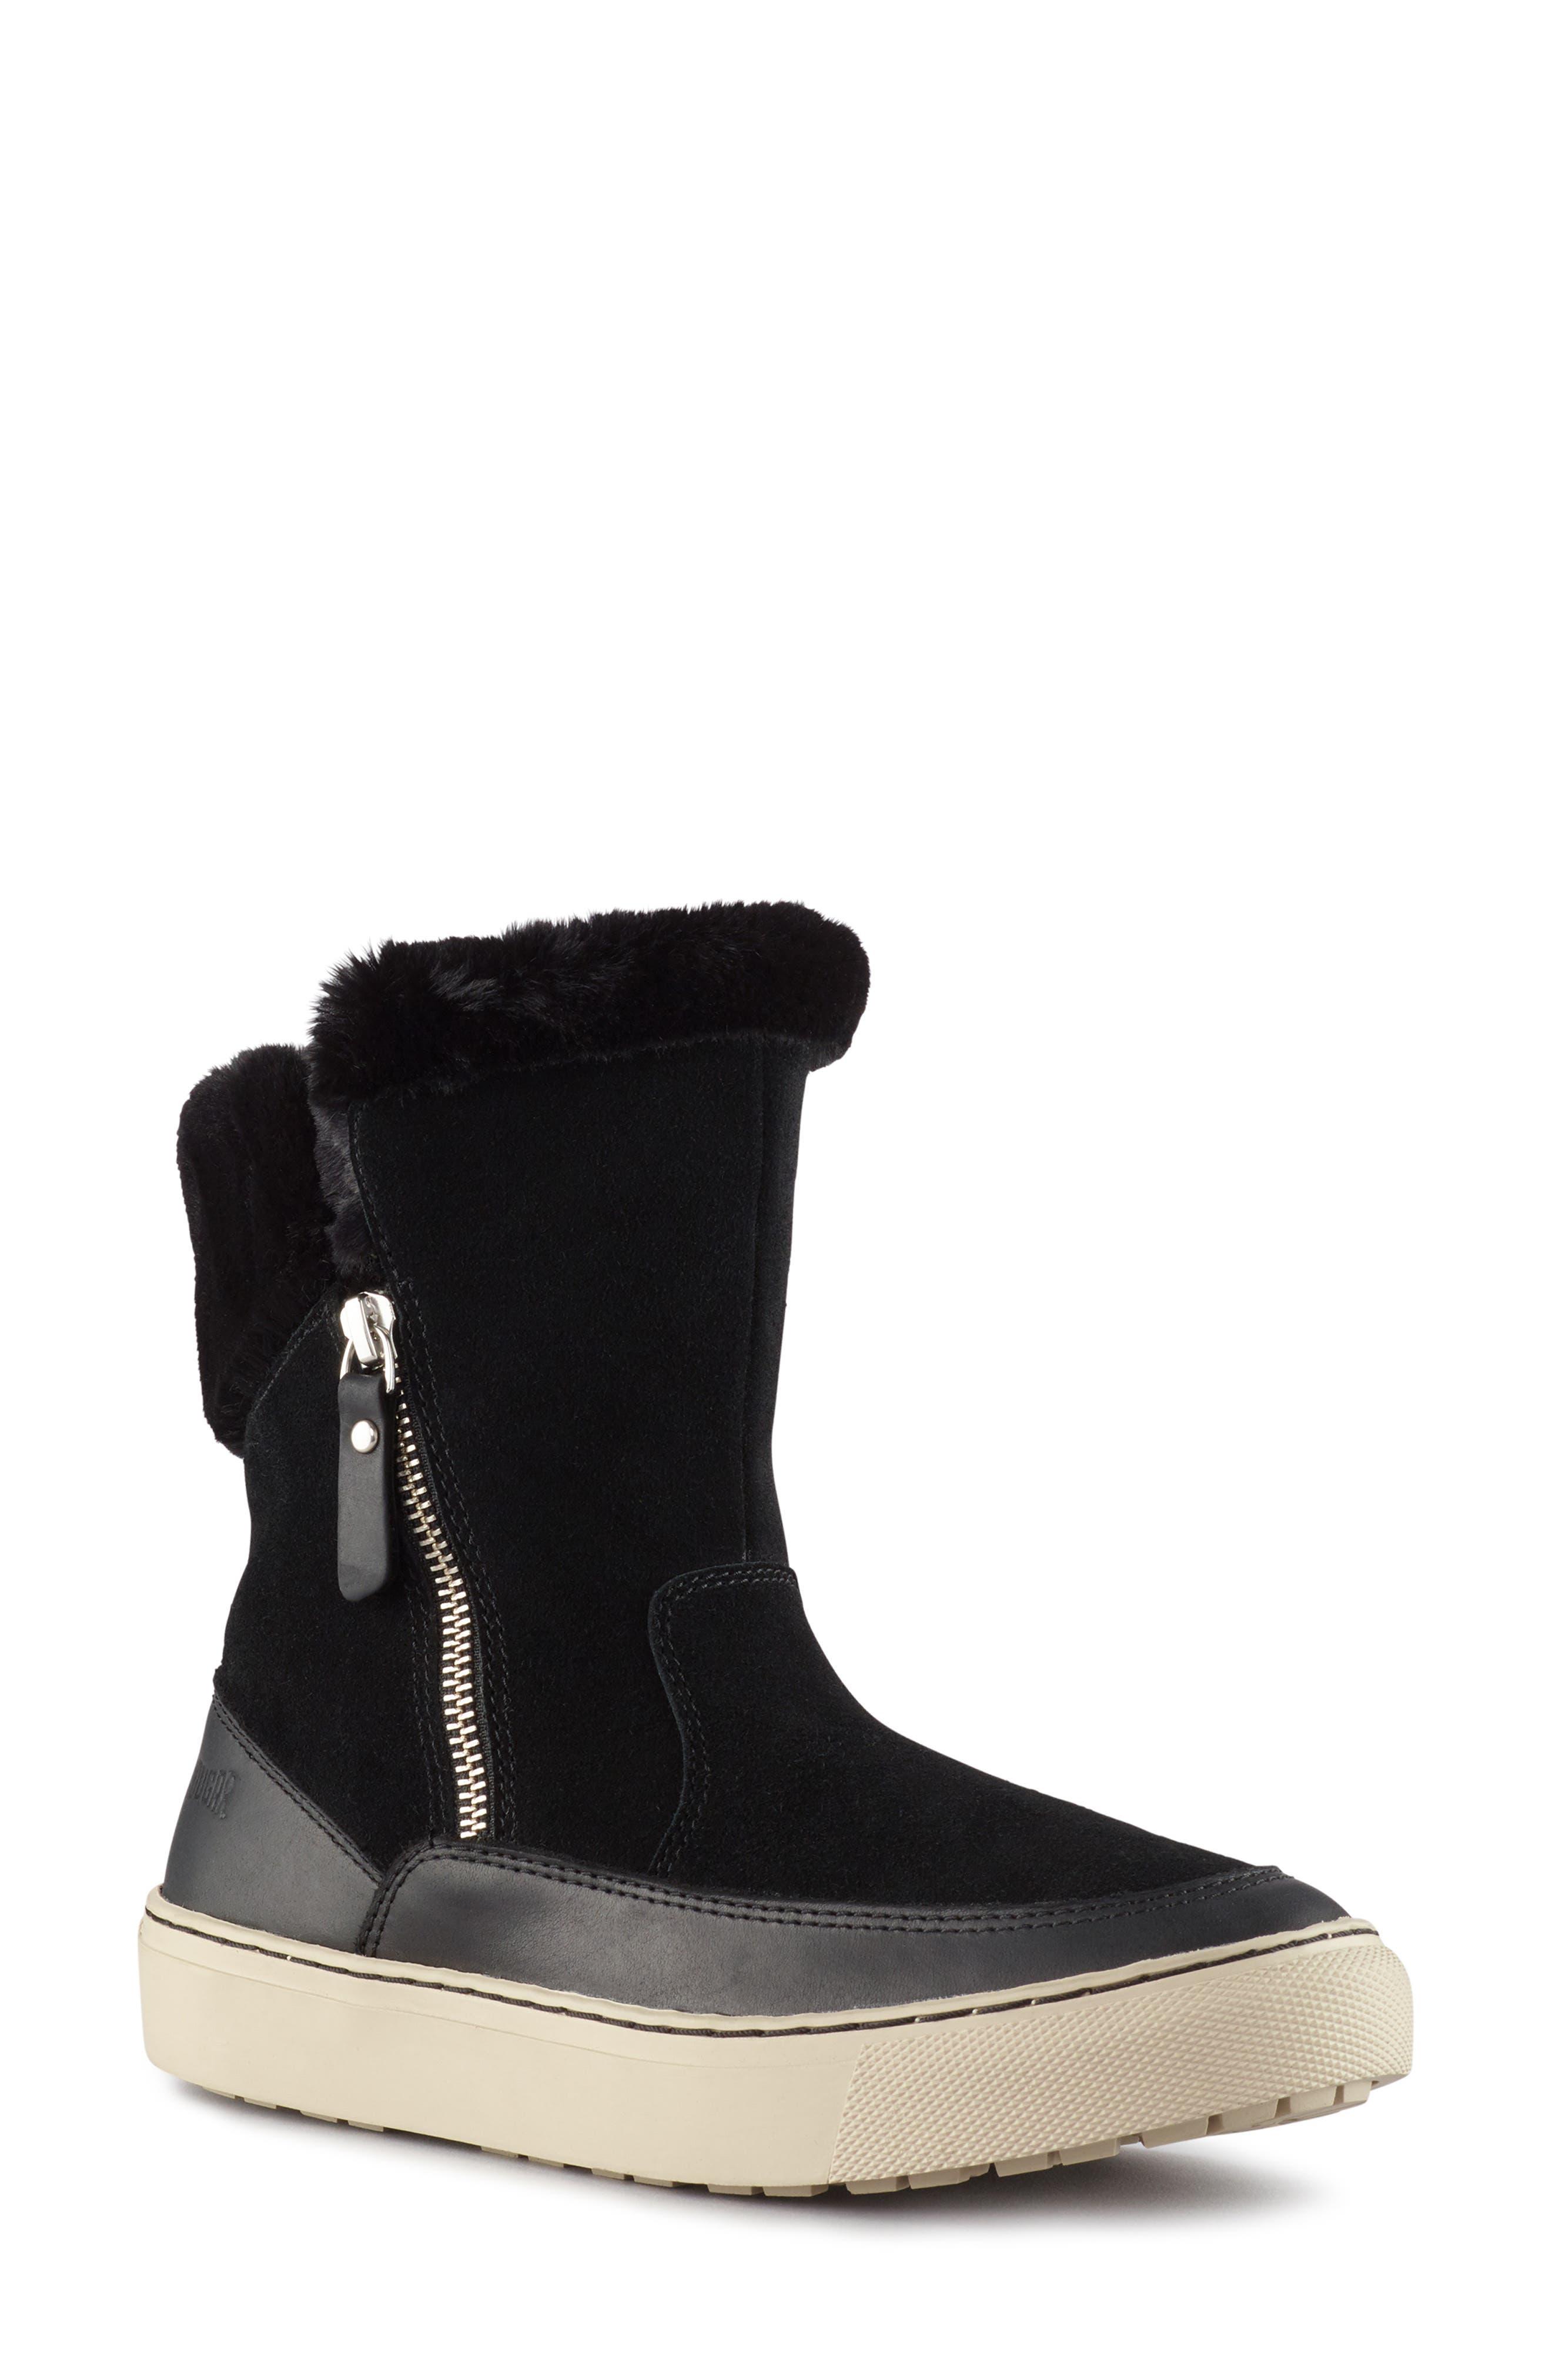 Dresden Waterproof Sneaker Boot with Faux Fur Trim, Main, color, 001